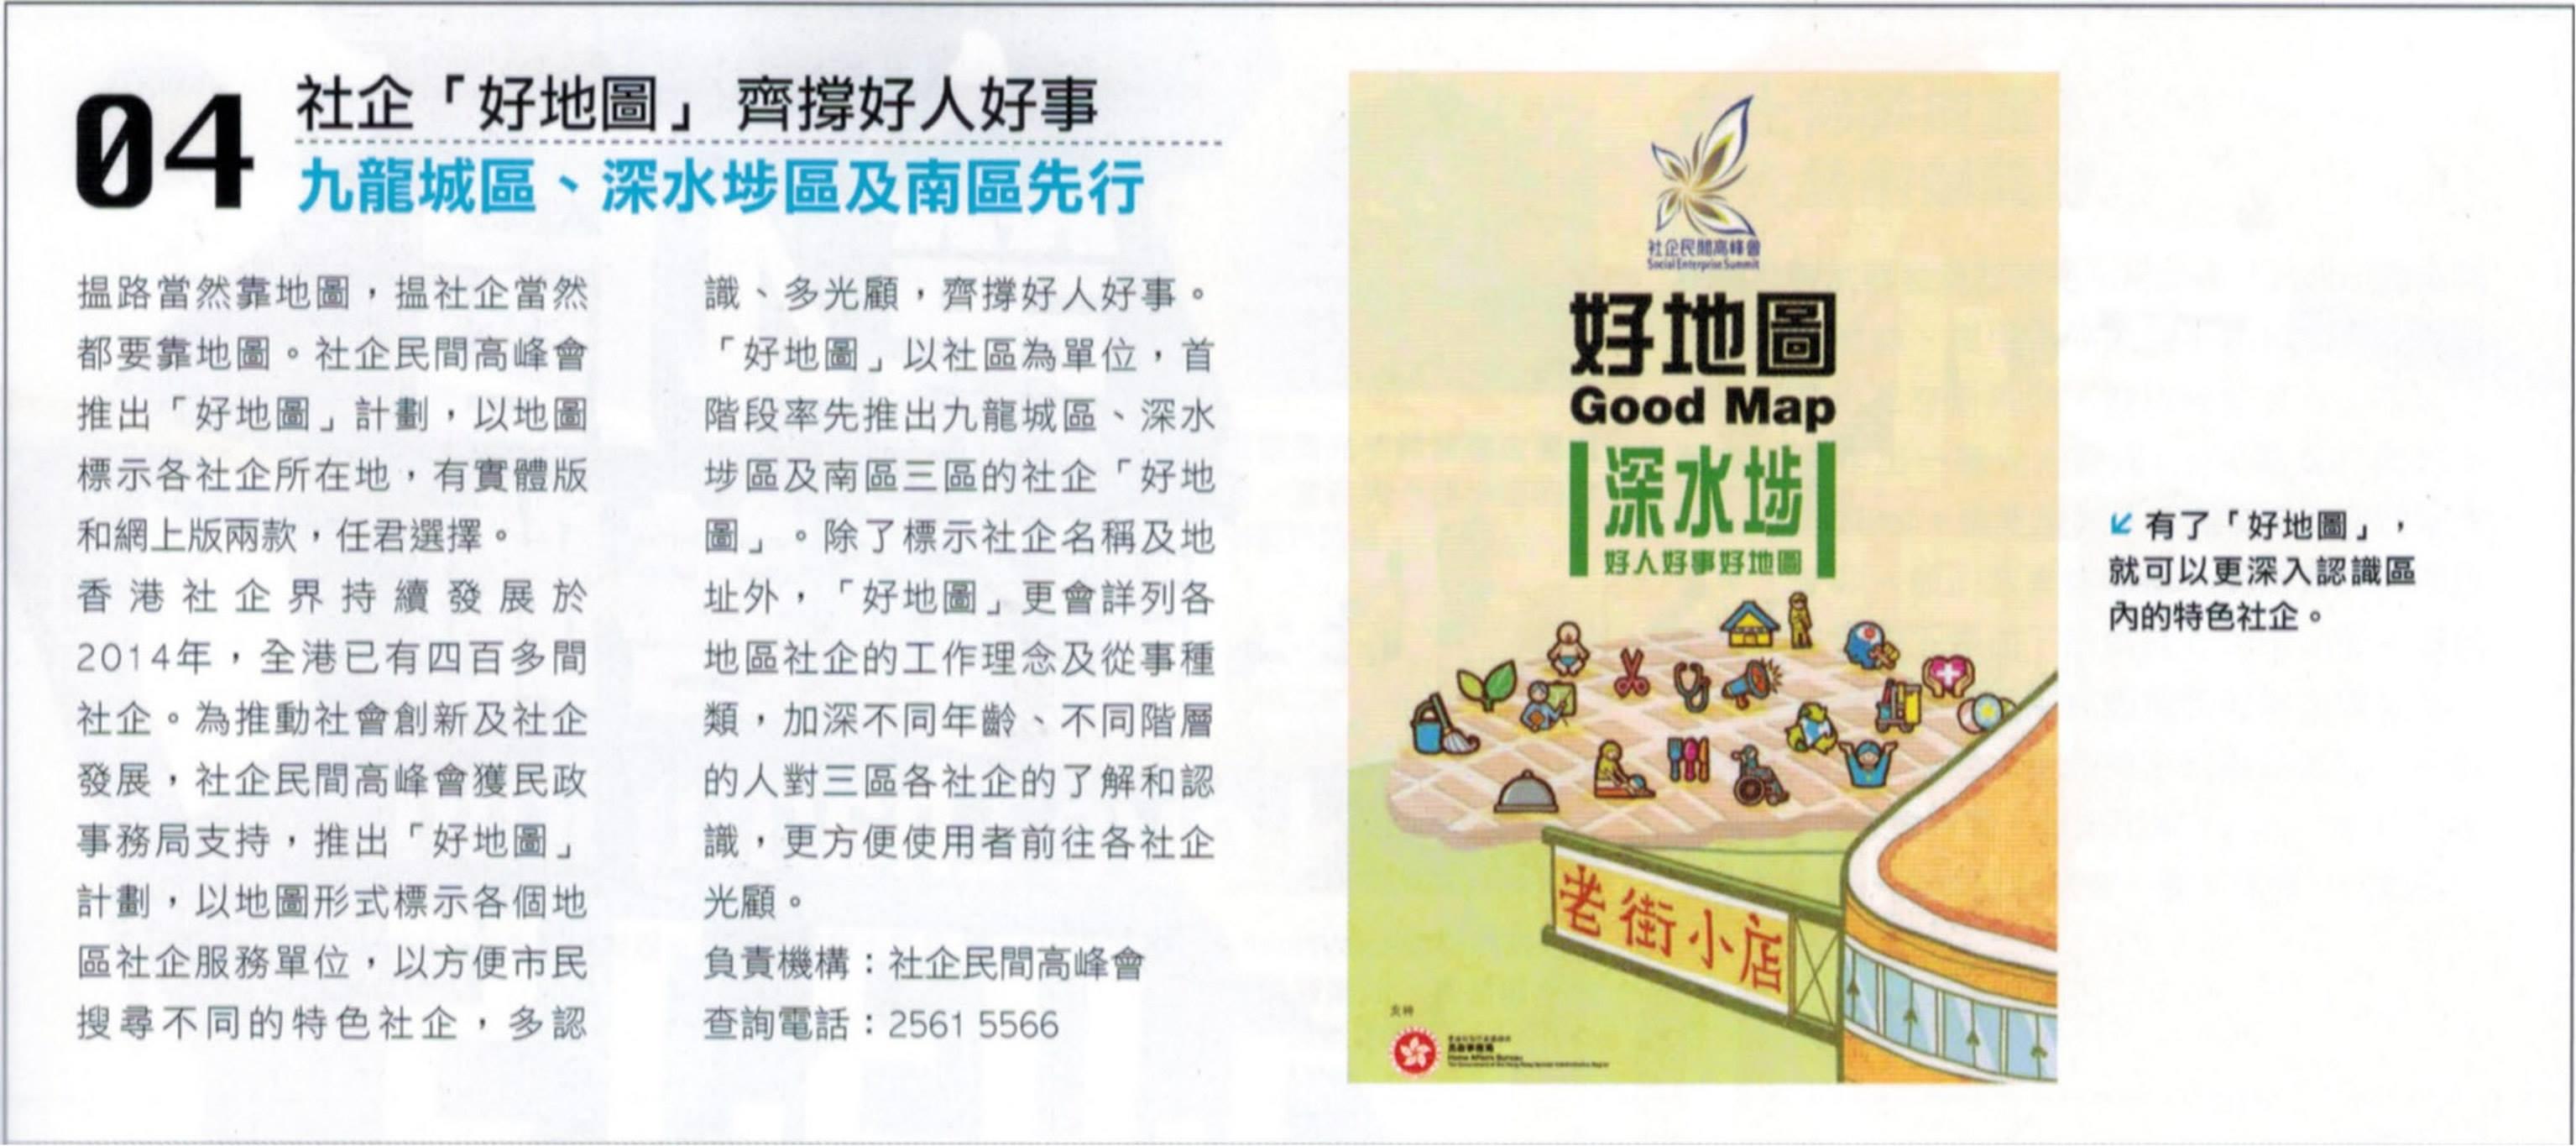 Good map 4